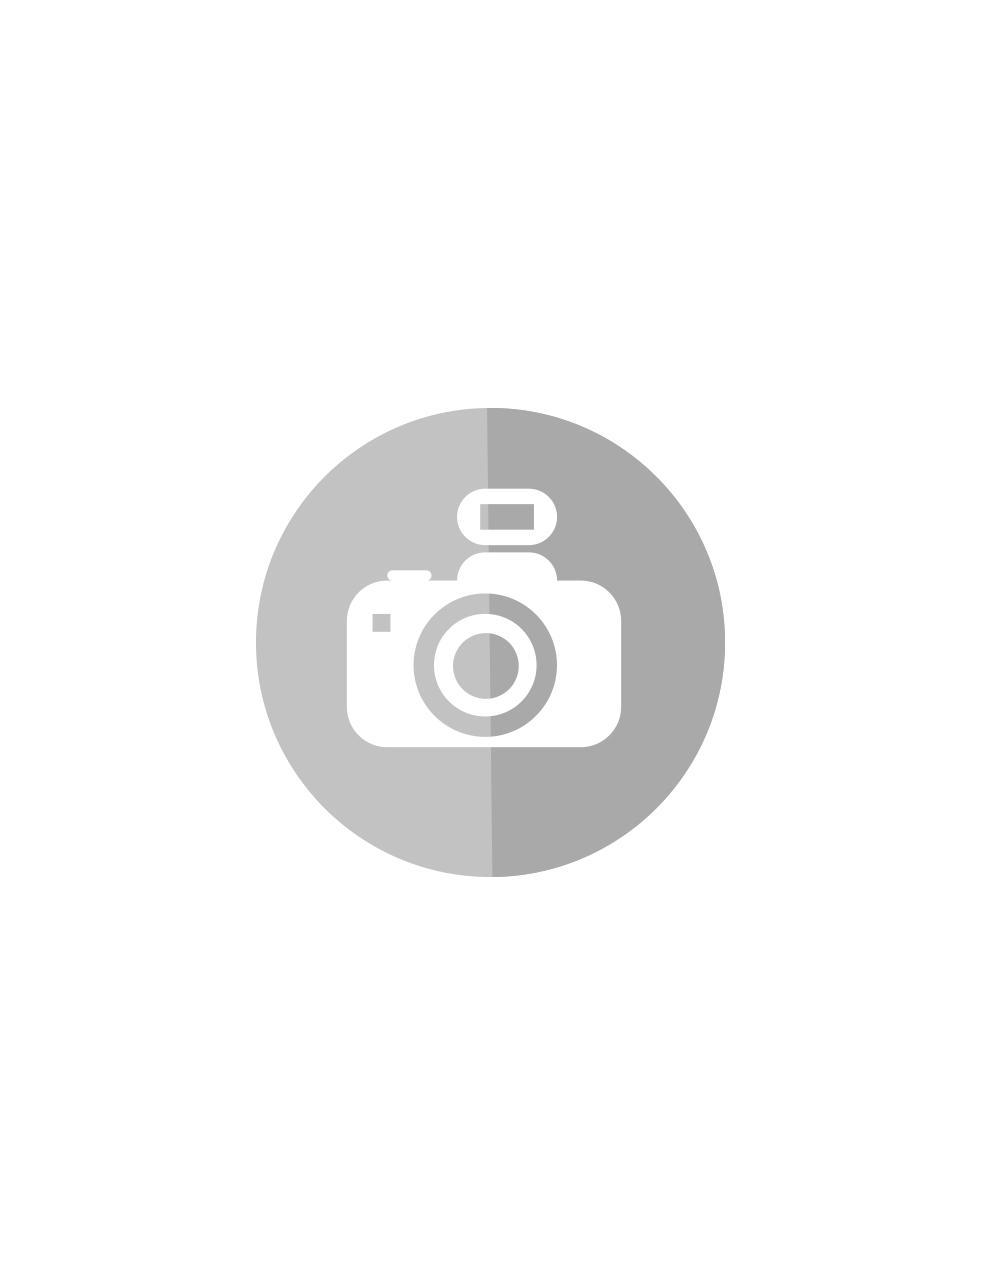 30058332_sparepart/Miniklappbox-Gehäuse